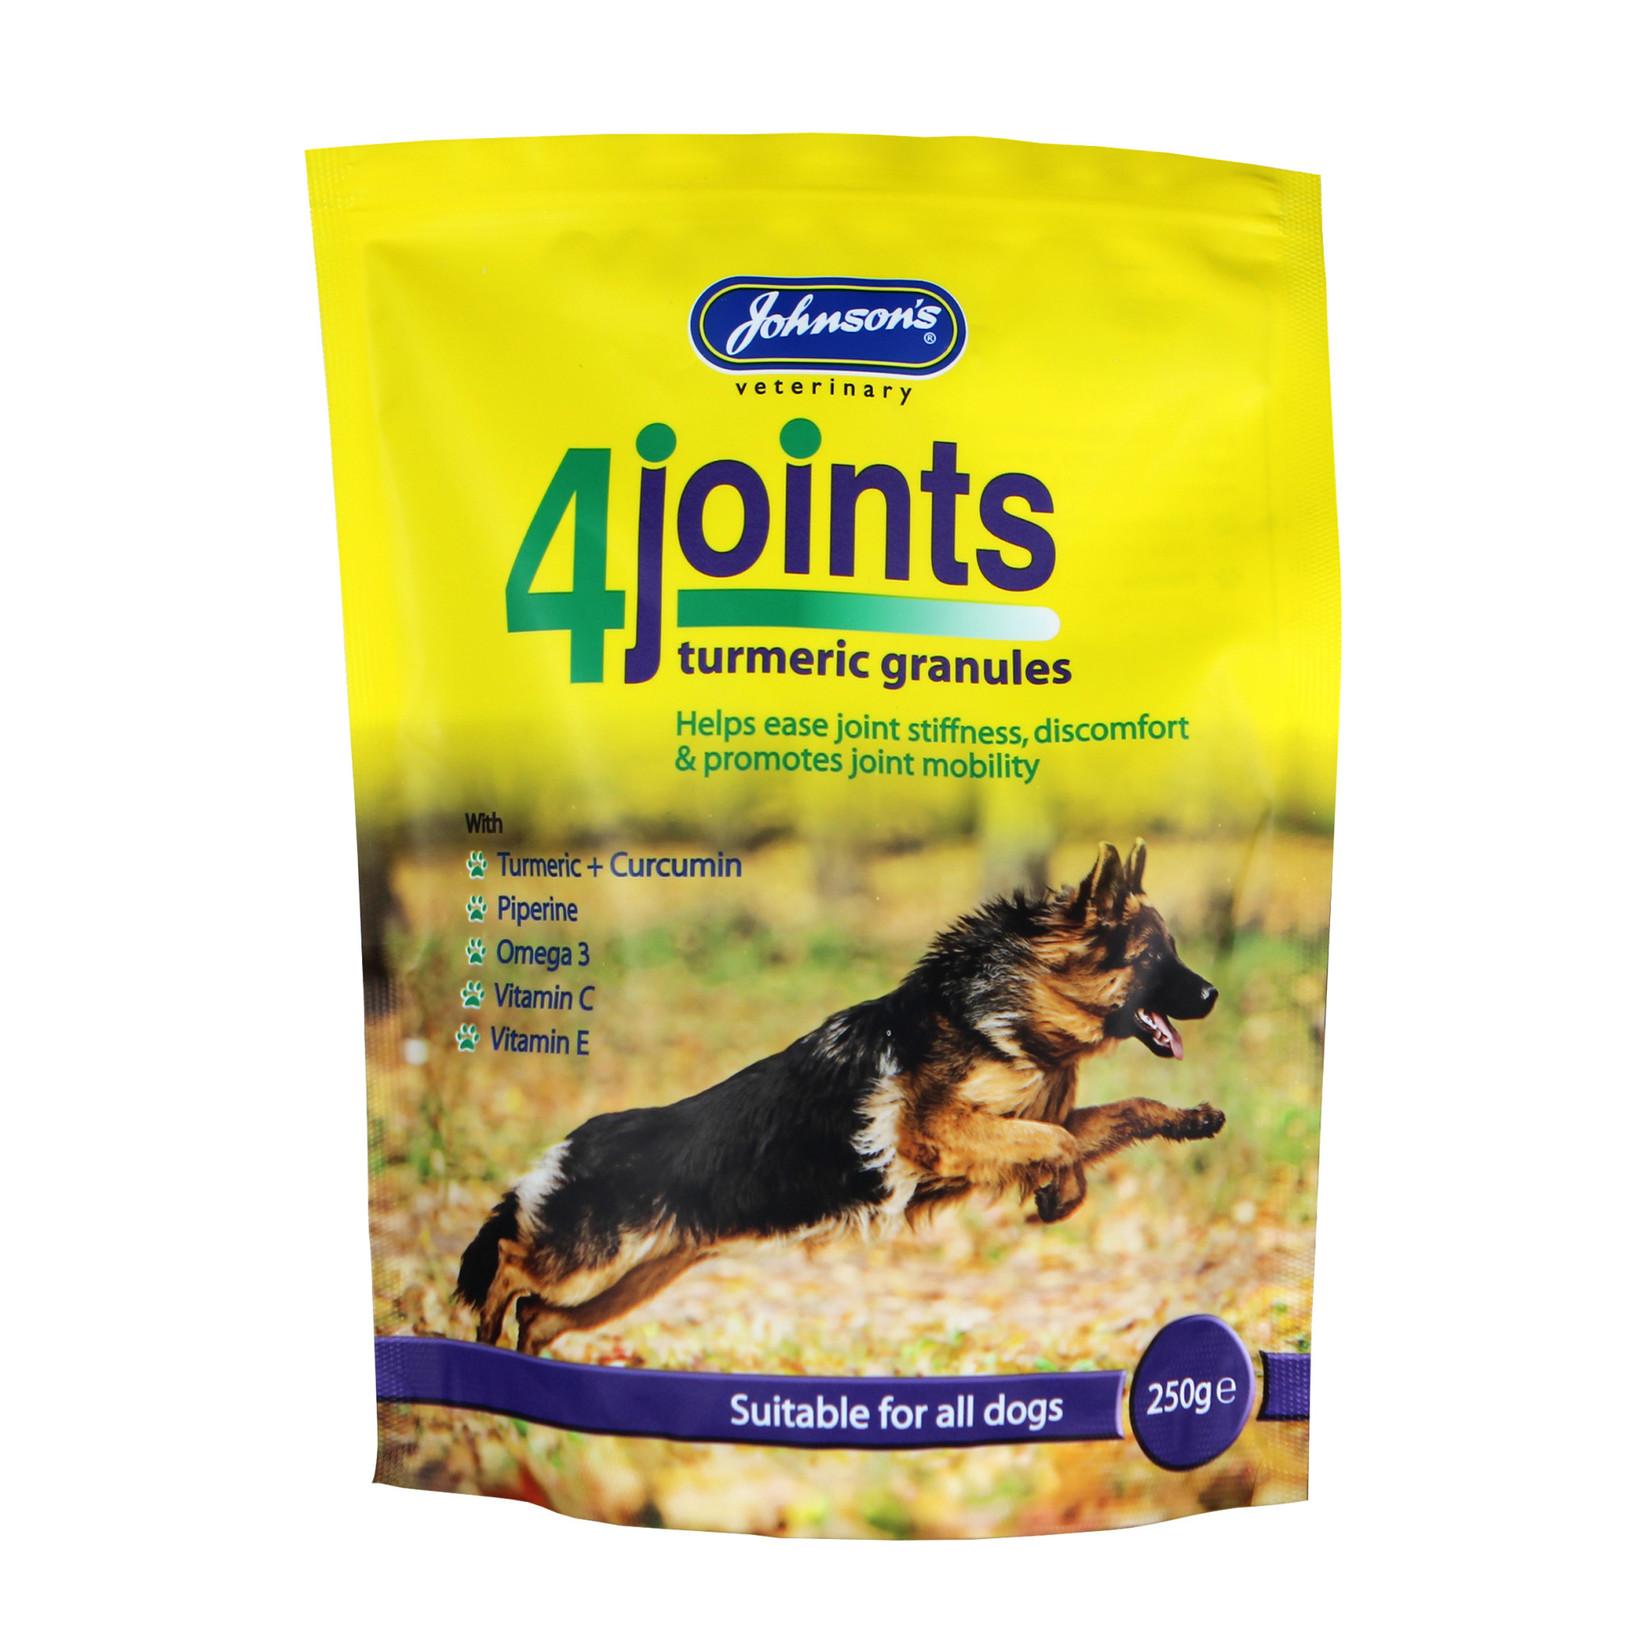 Johnson's Veterinary 4Joints Turmeric Granules Joint Supplement for Dogs, 250g